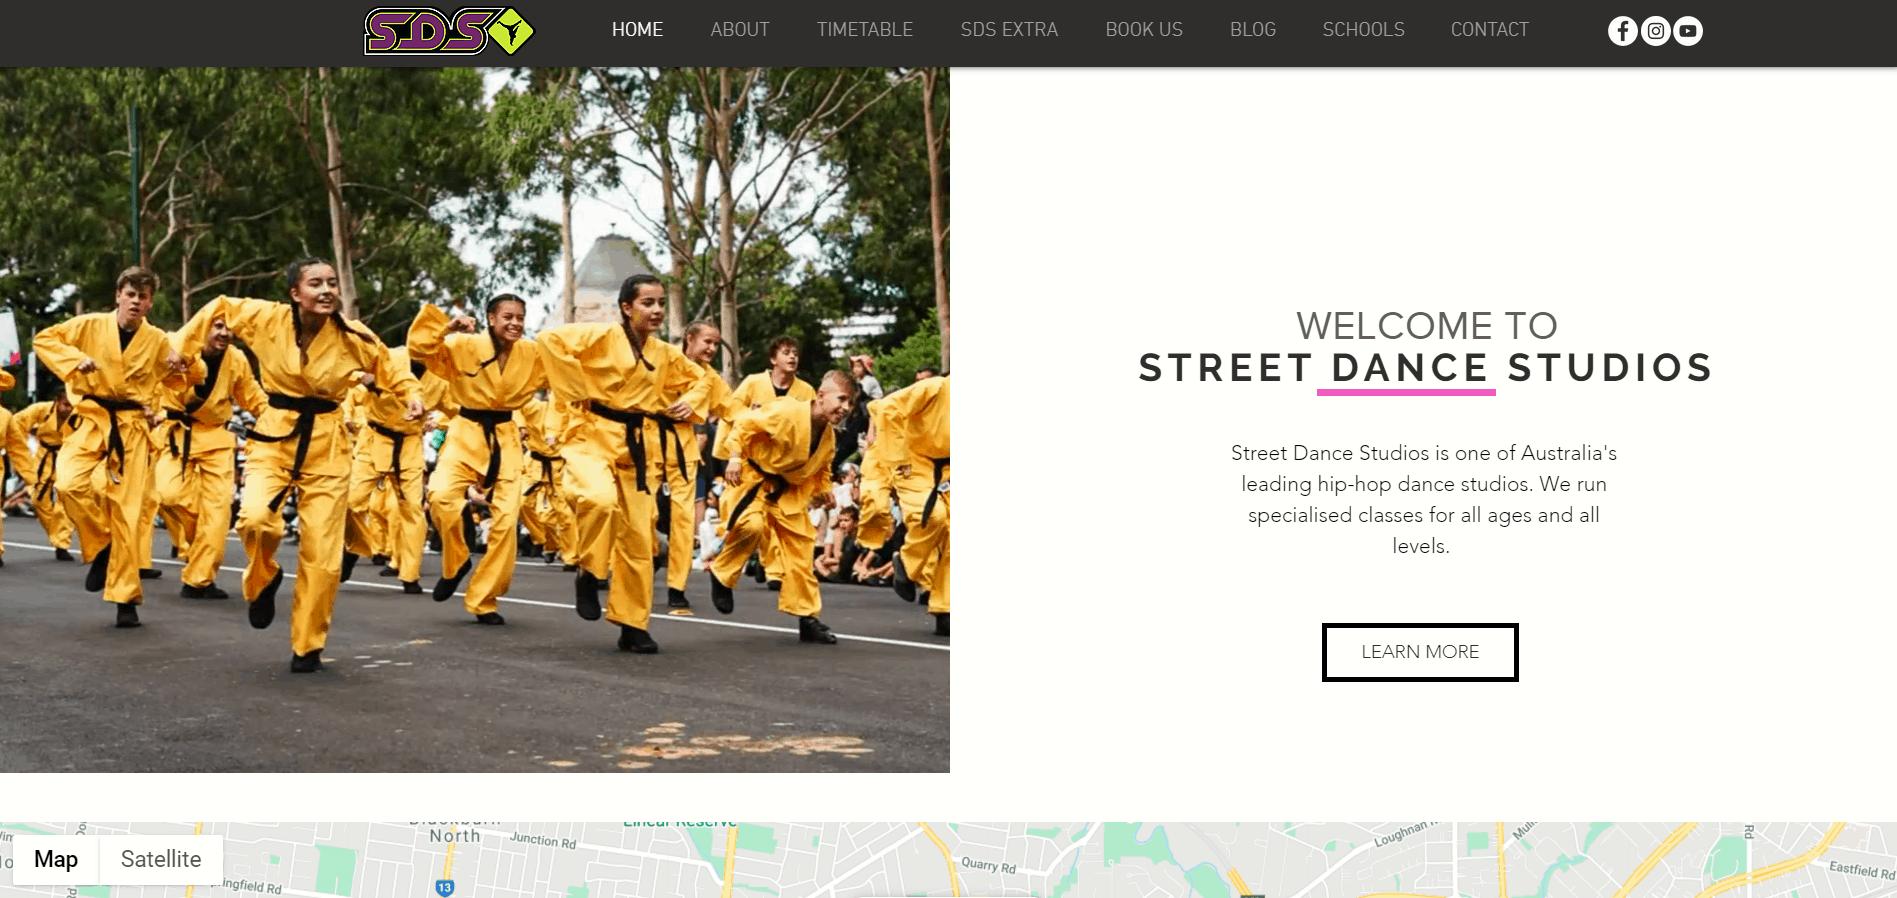 Street Dance Studios